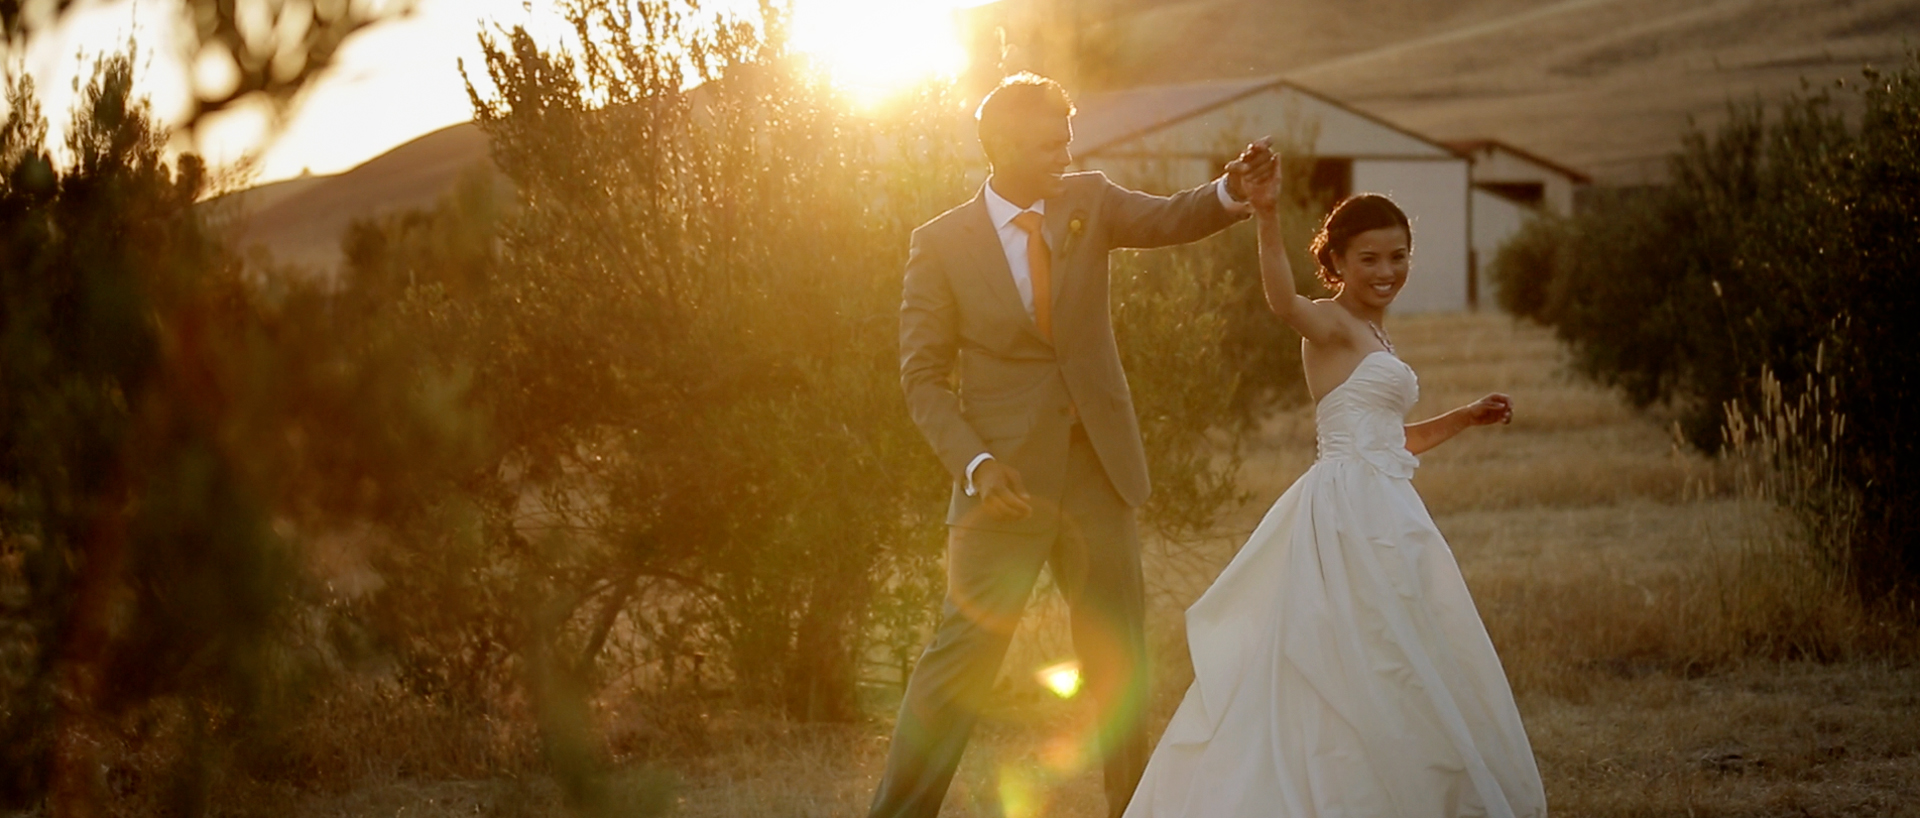 Livermore Wedding Videography Aperina Studios